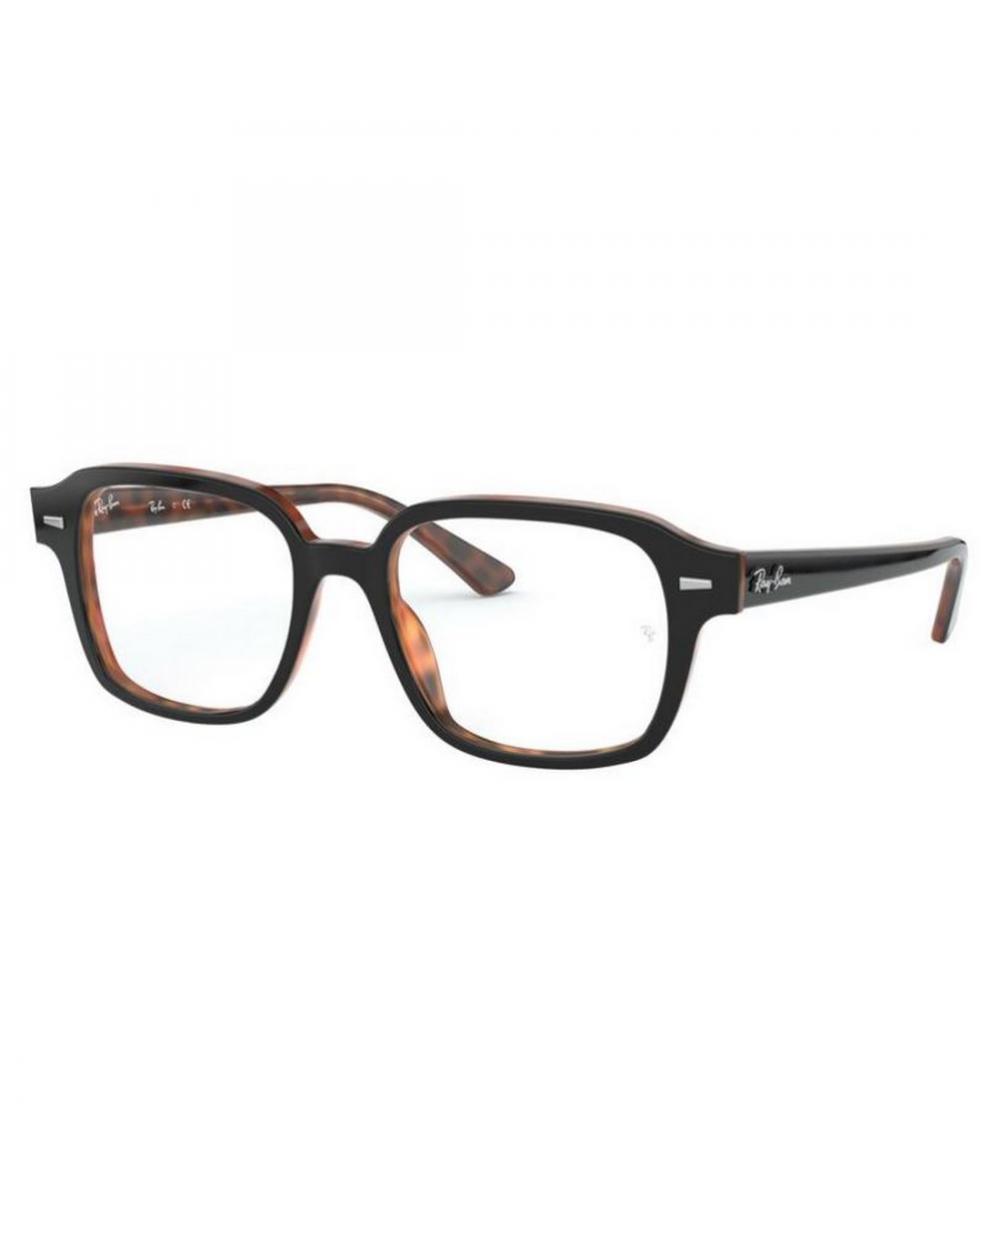 Les verres de lunettes de vue Ray Ban RX 5382V emballage d'origine garantie Italie